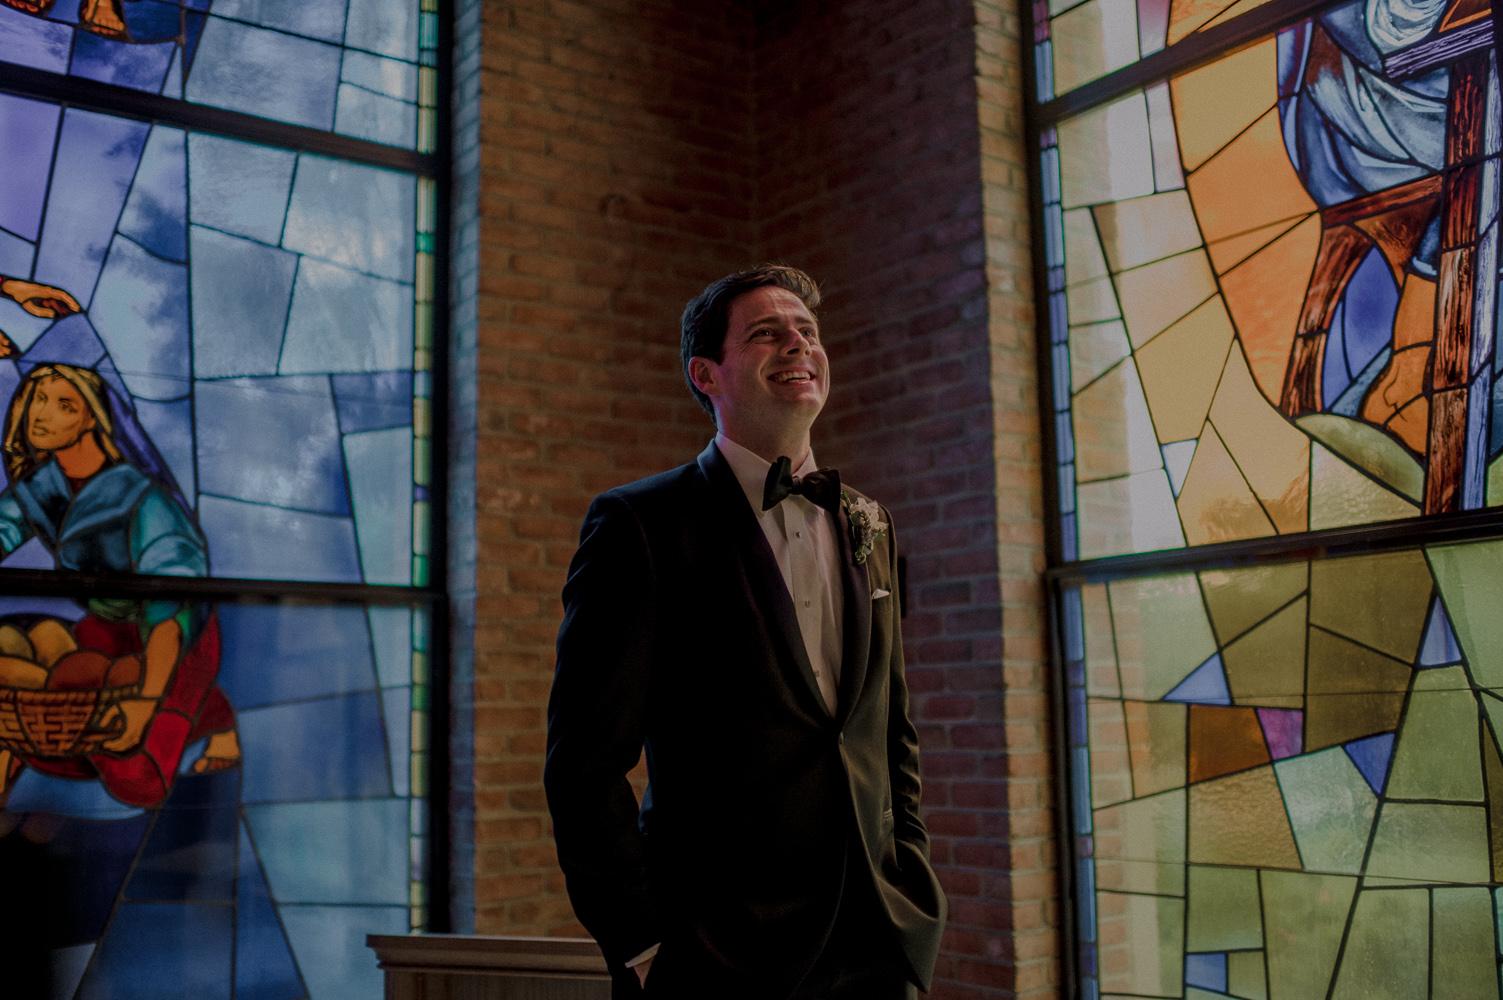 corpus christi wedding chatham nj